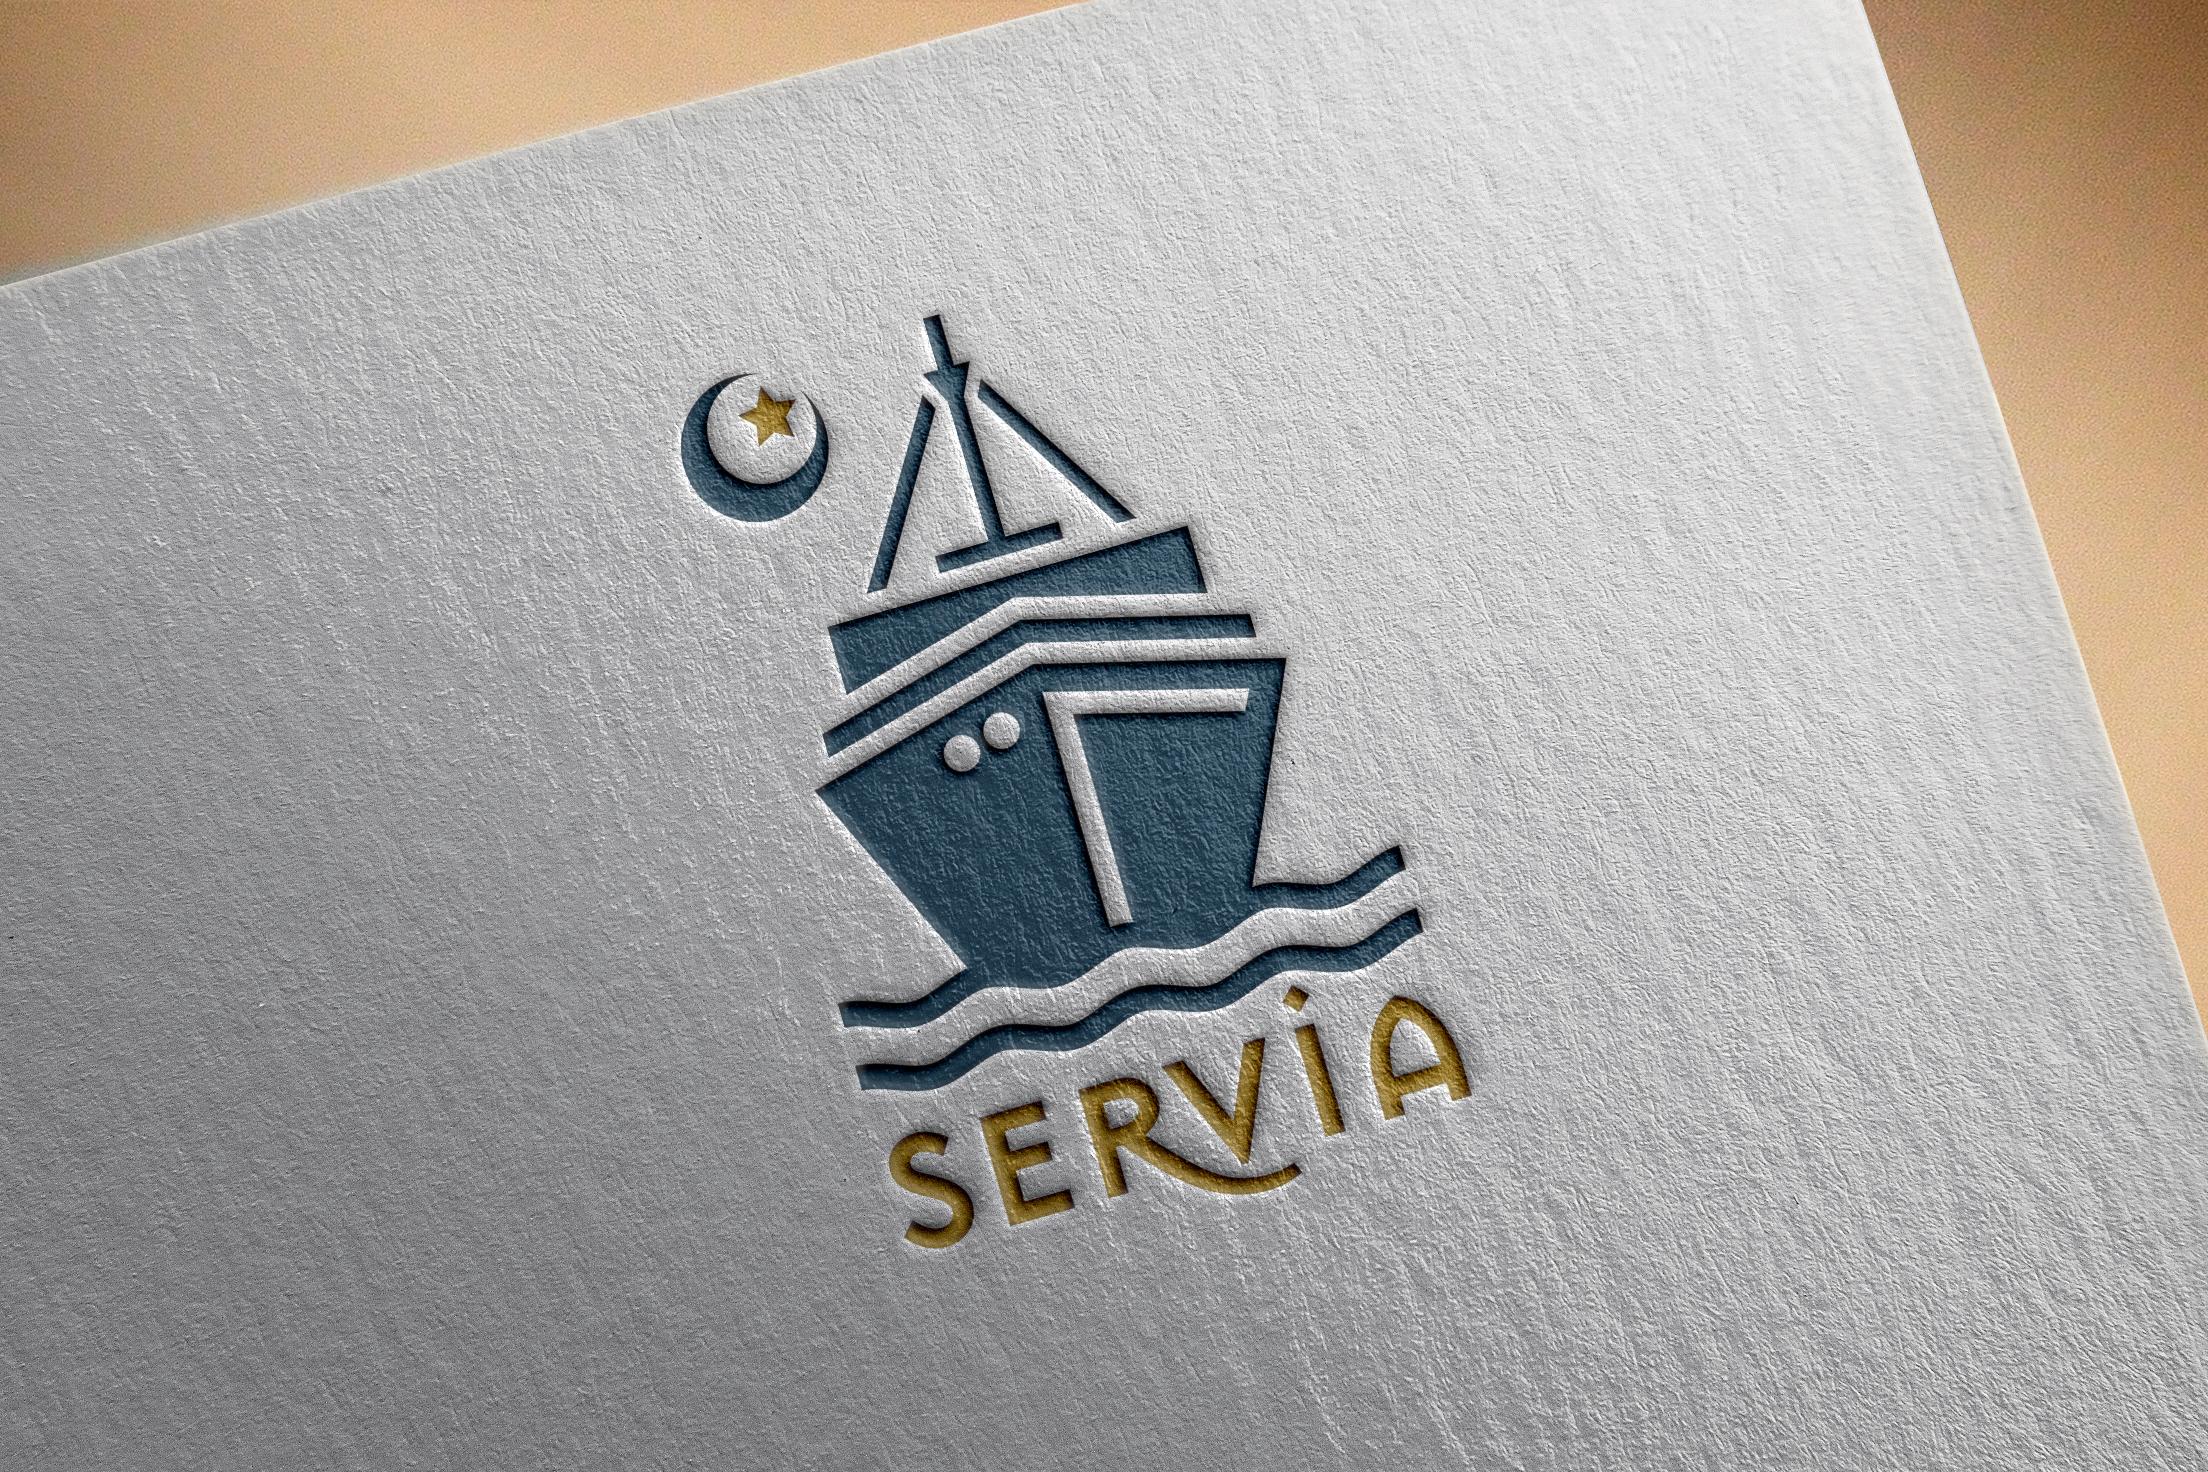 Servia Restaurant